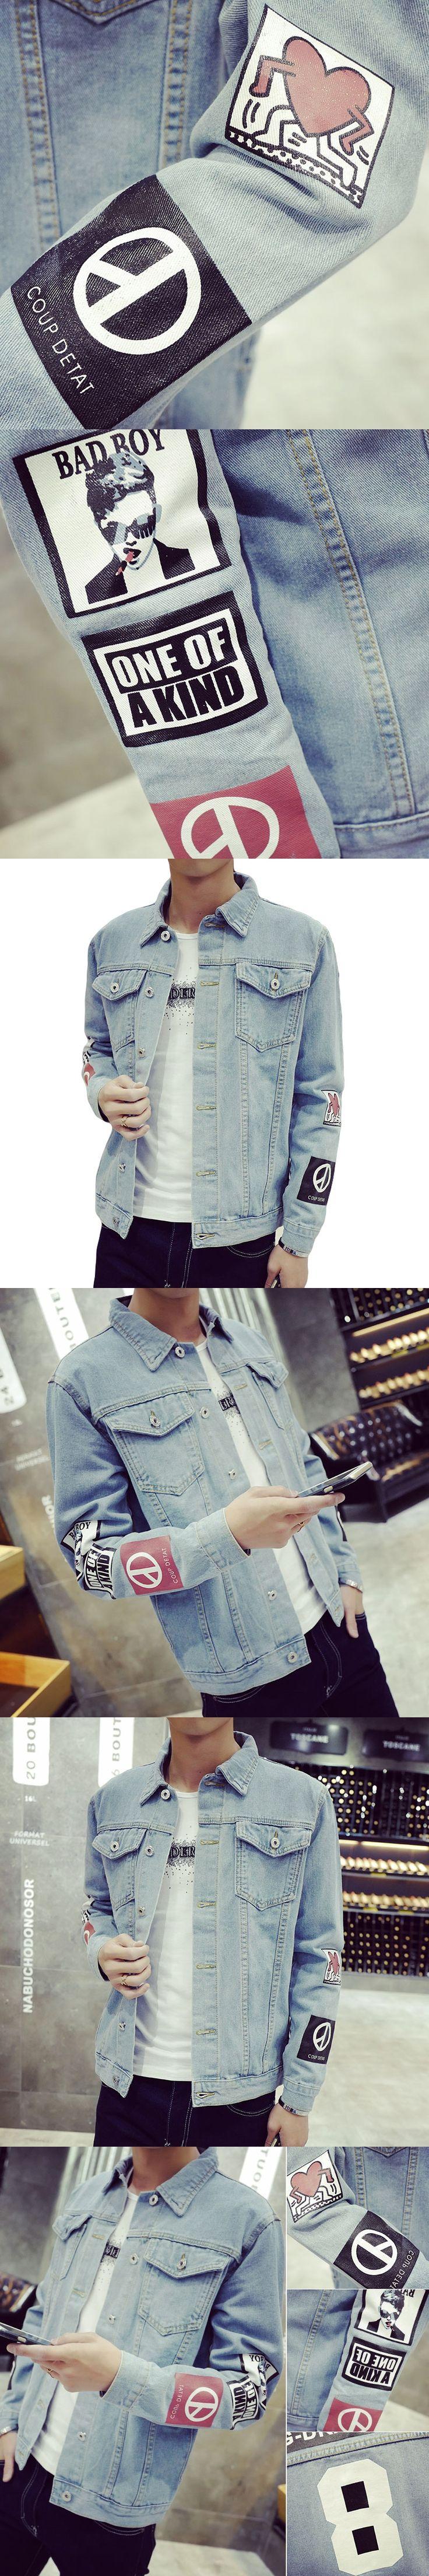 Fashion Men's Denim Jacket M-5XL Men Windbreaker Blue Hip Hop Casual Jeans Outfit Korean Slim Fit Mens Jackets and Coats TC455